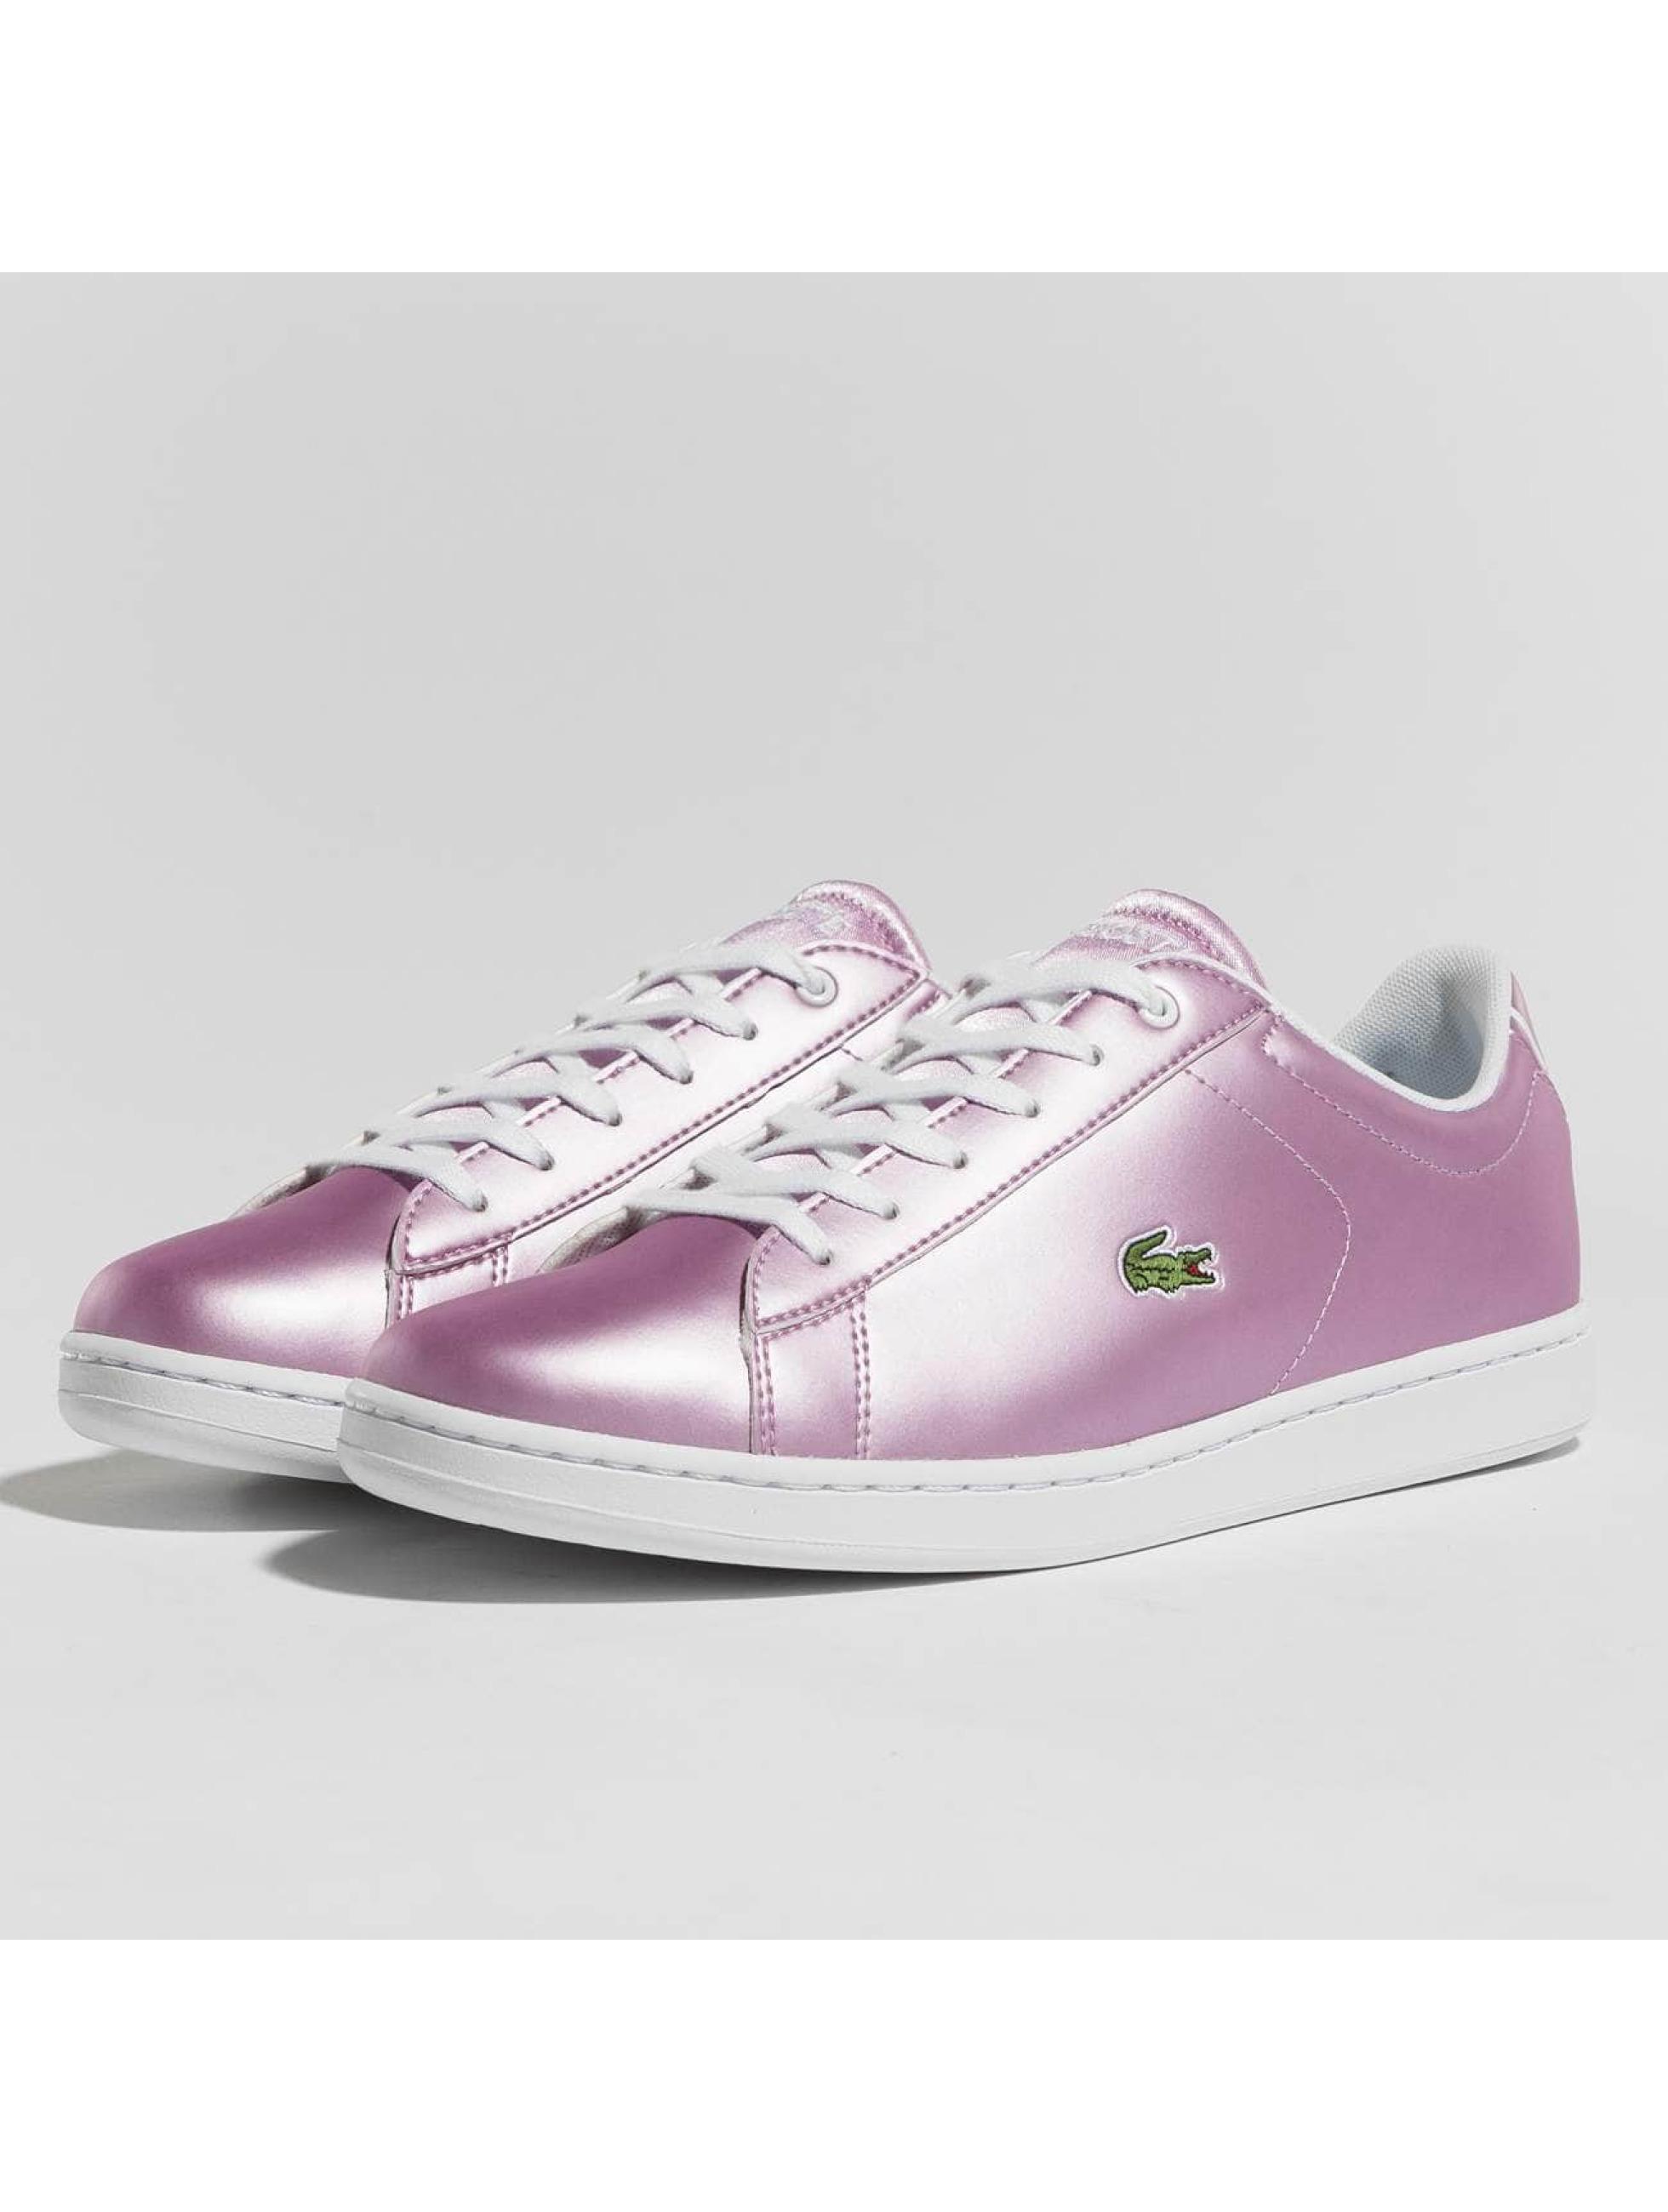 lacoste damen sneaker carnaby evo in pink 438455. Black Bedroom Furniture Sets. Home Design Ideas